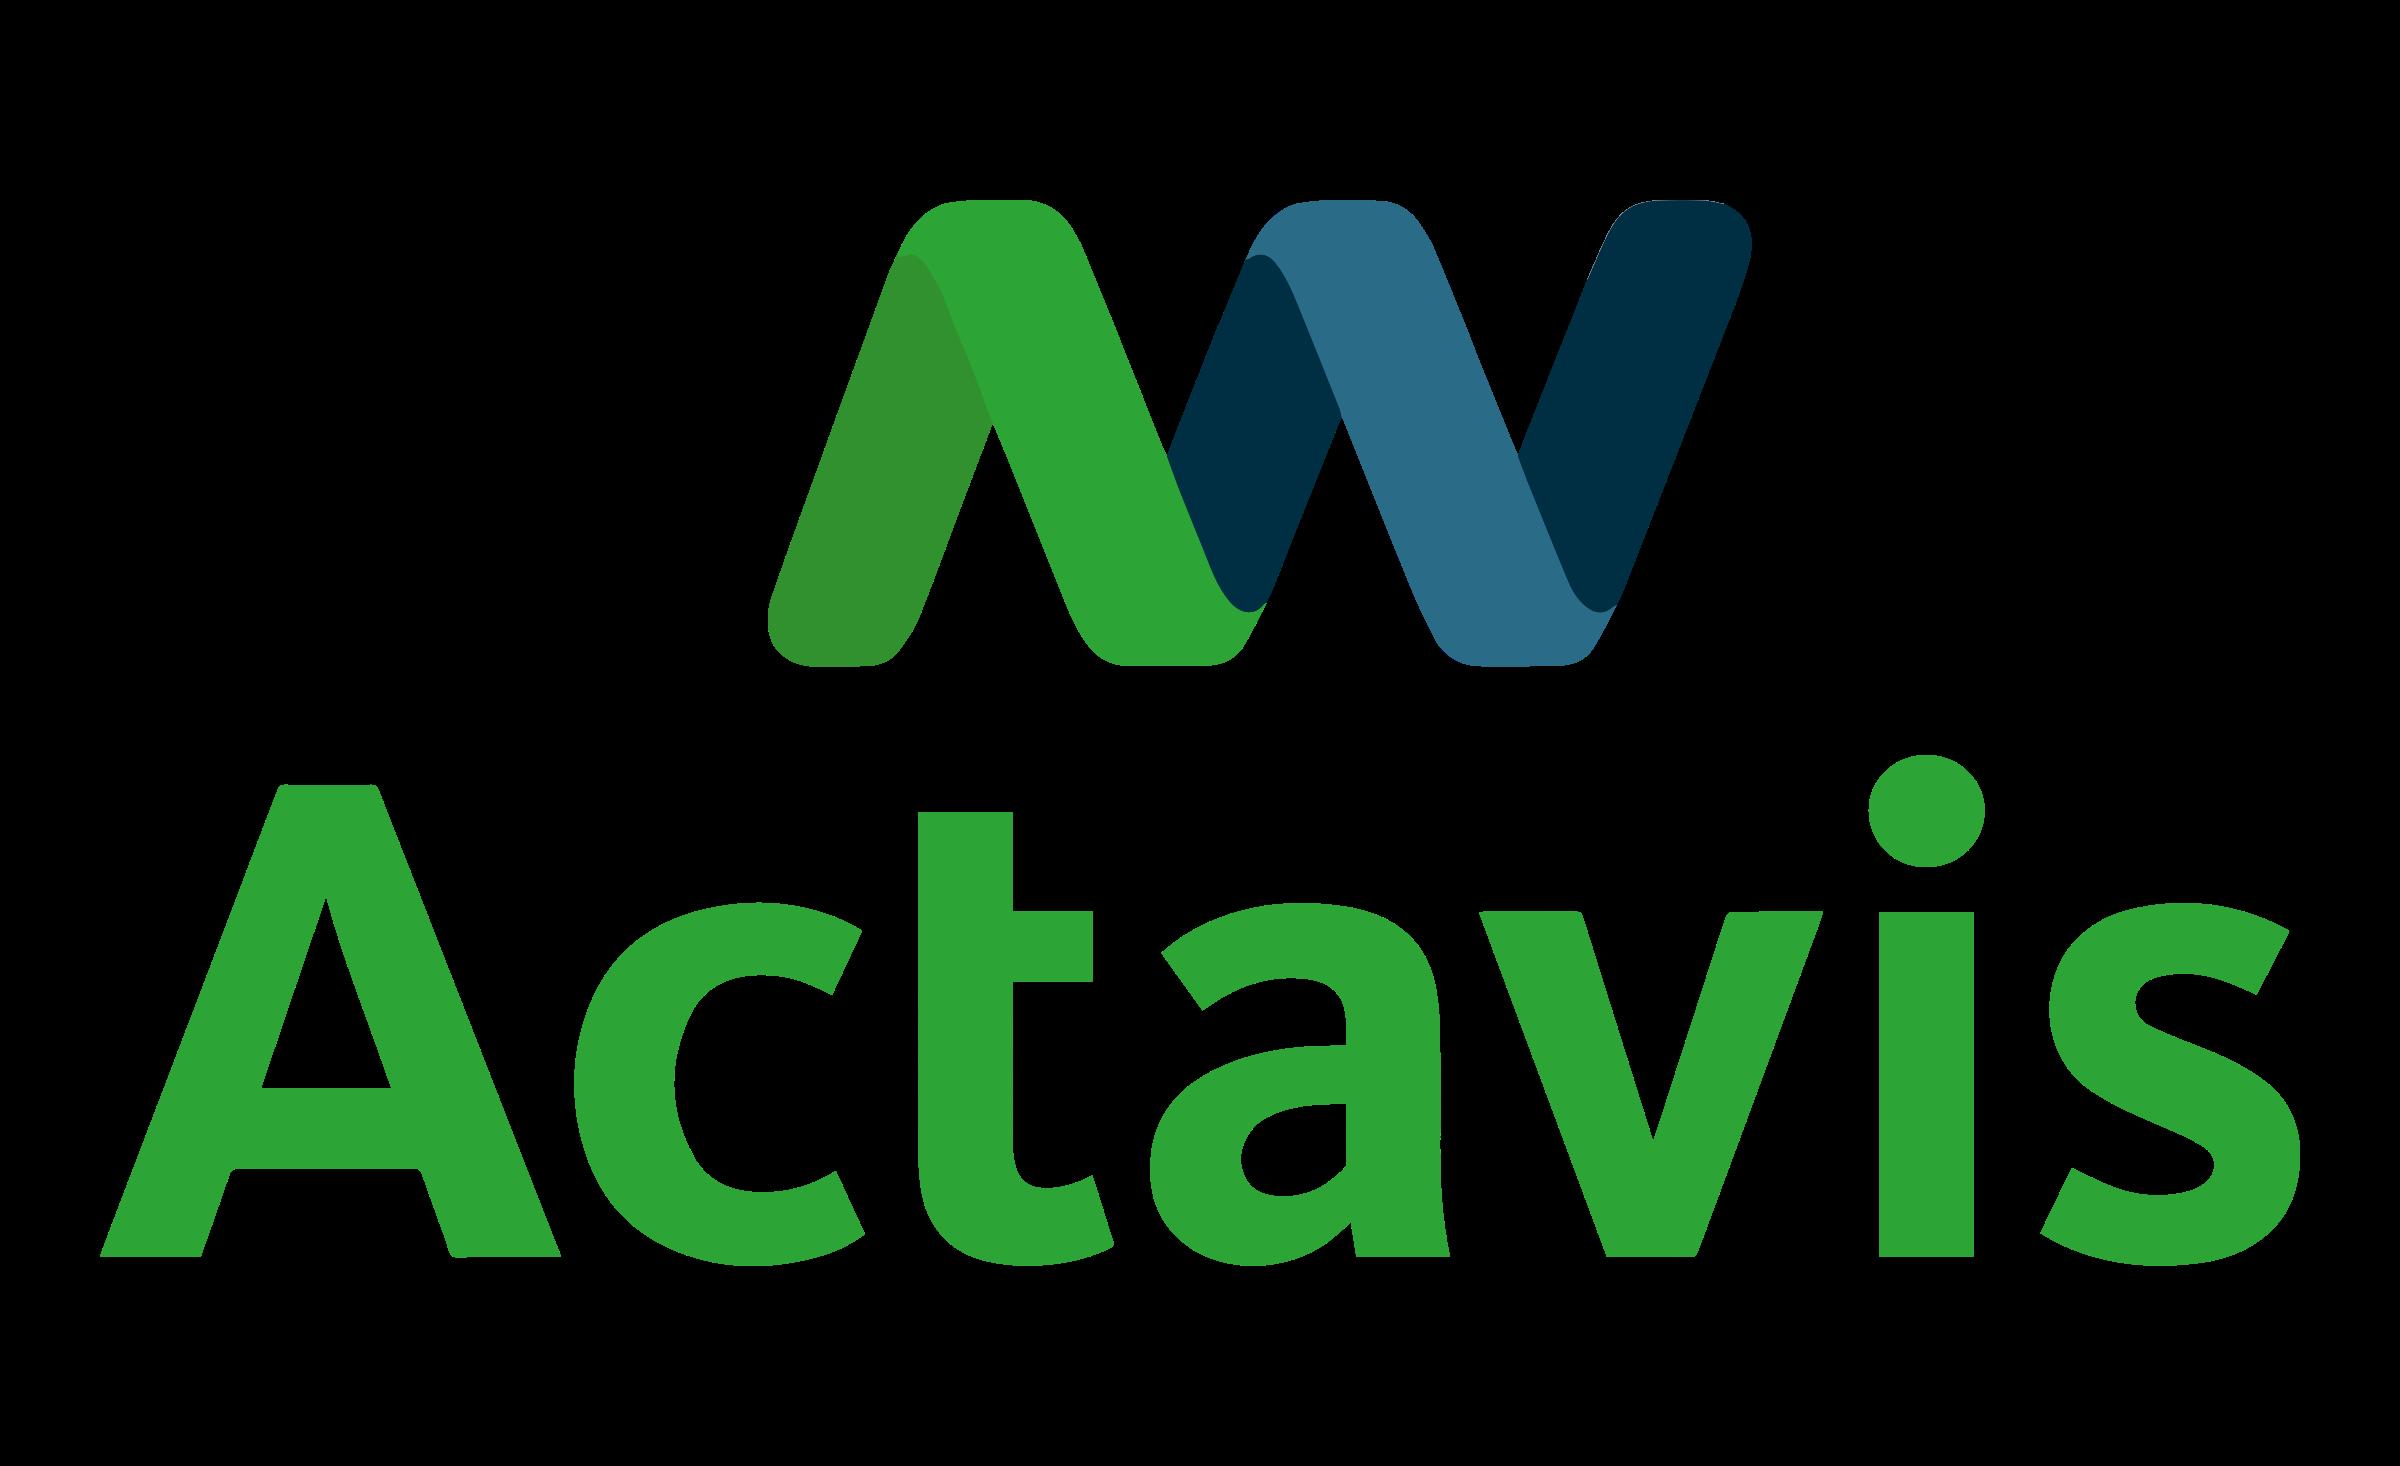 Actavis logo png transparent - Actavis PNG